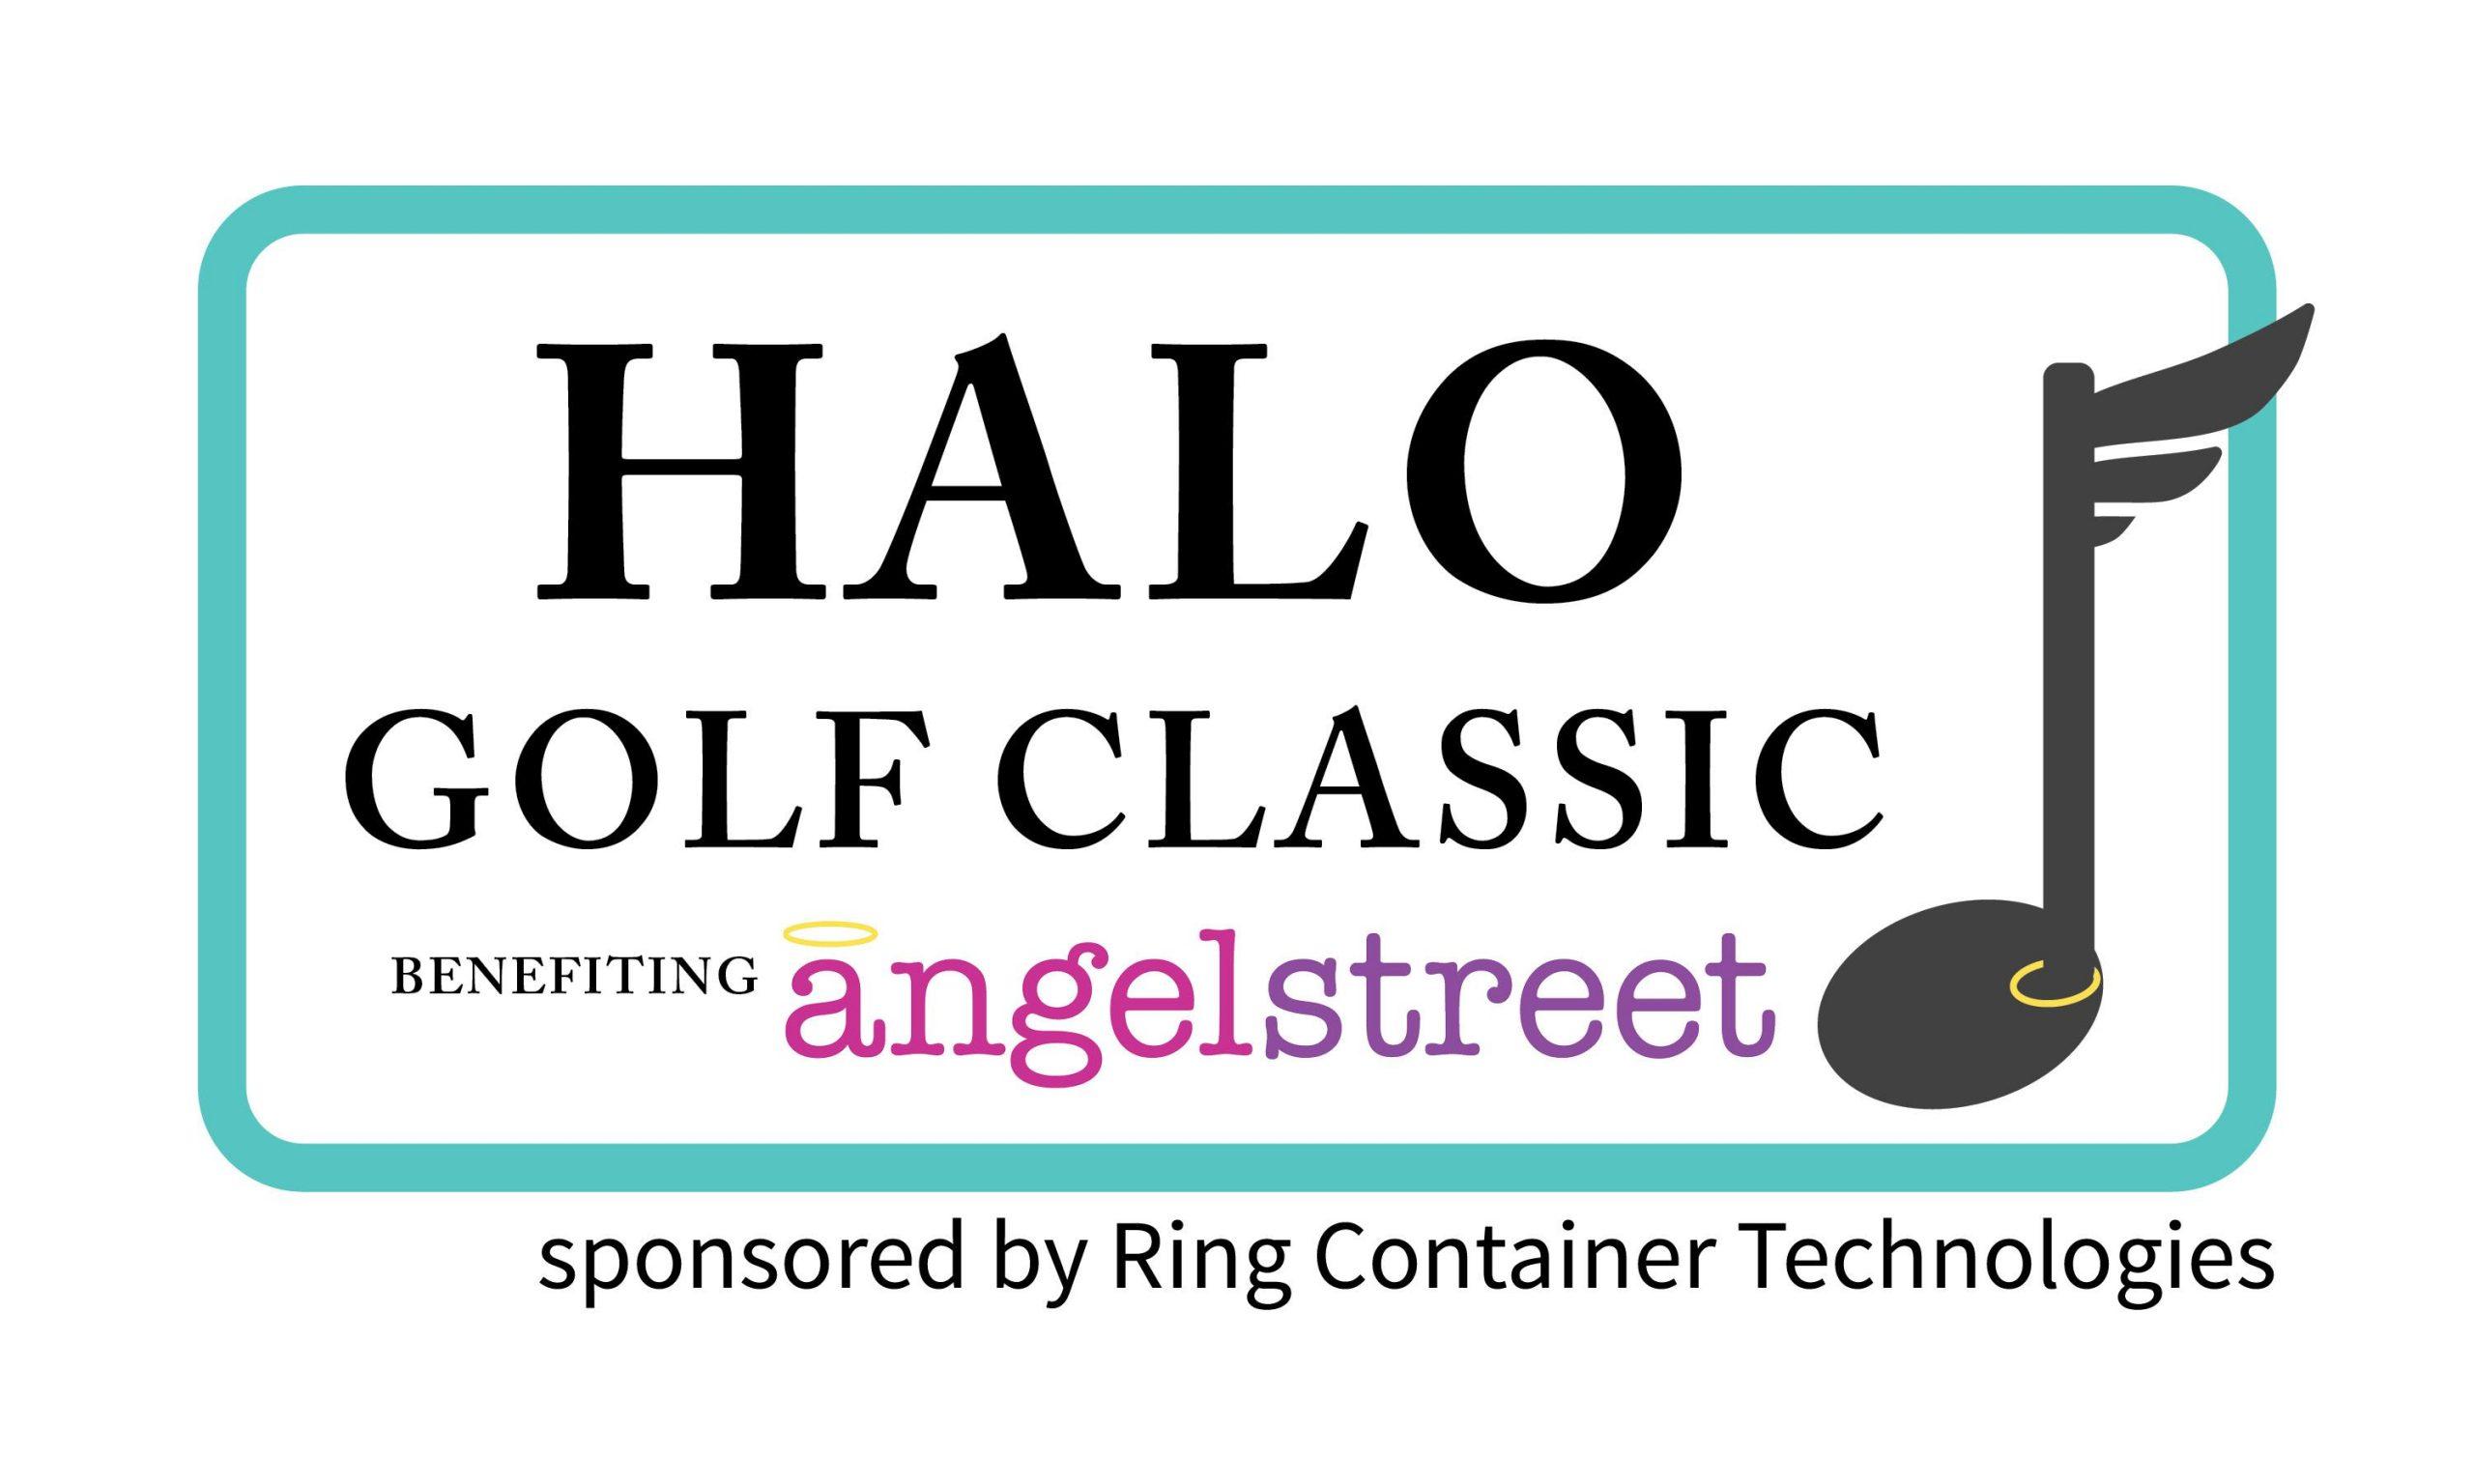 Halo Golf Classic, benefiting AngelStreet